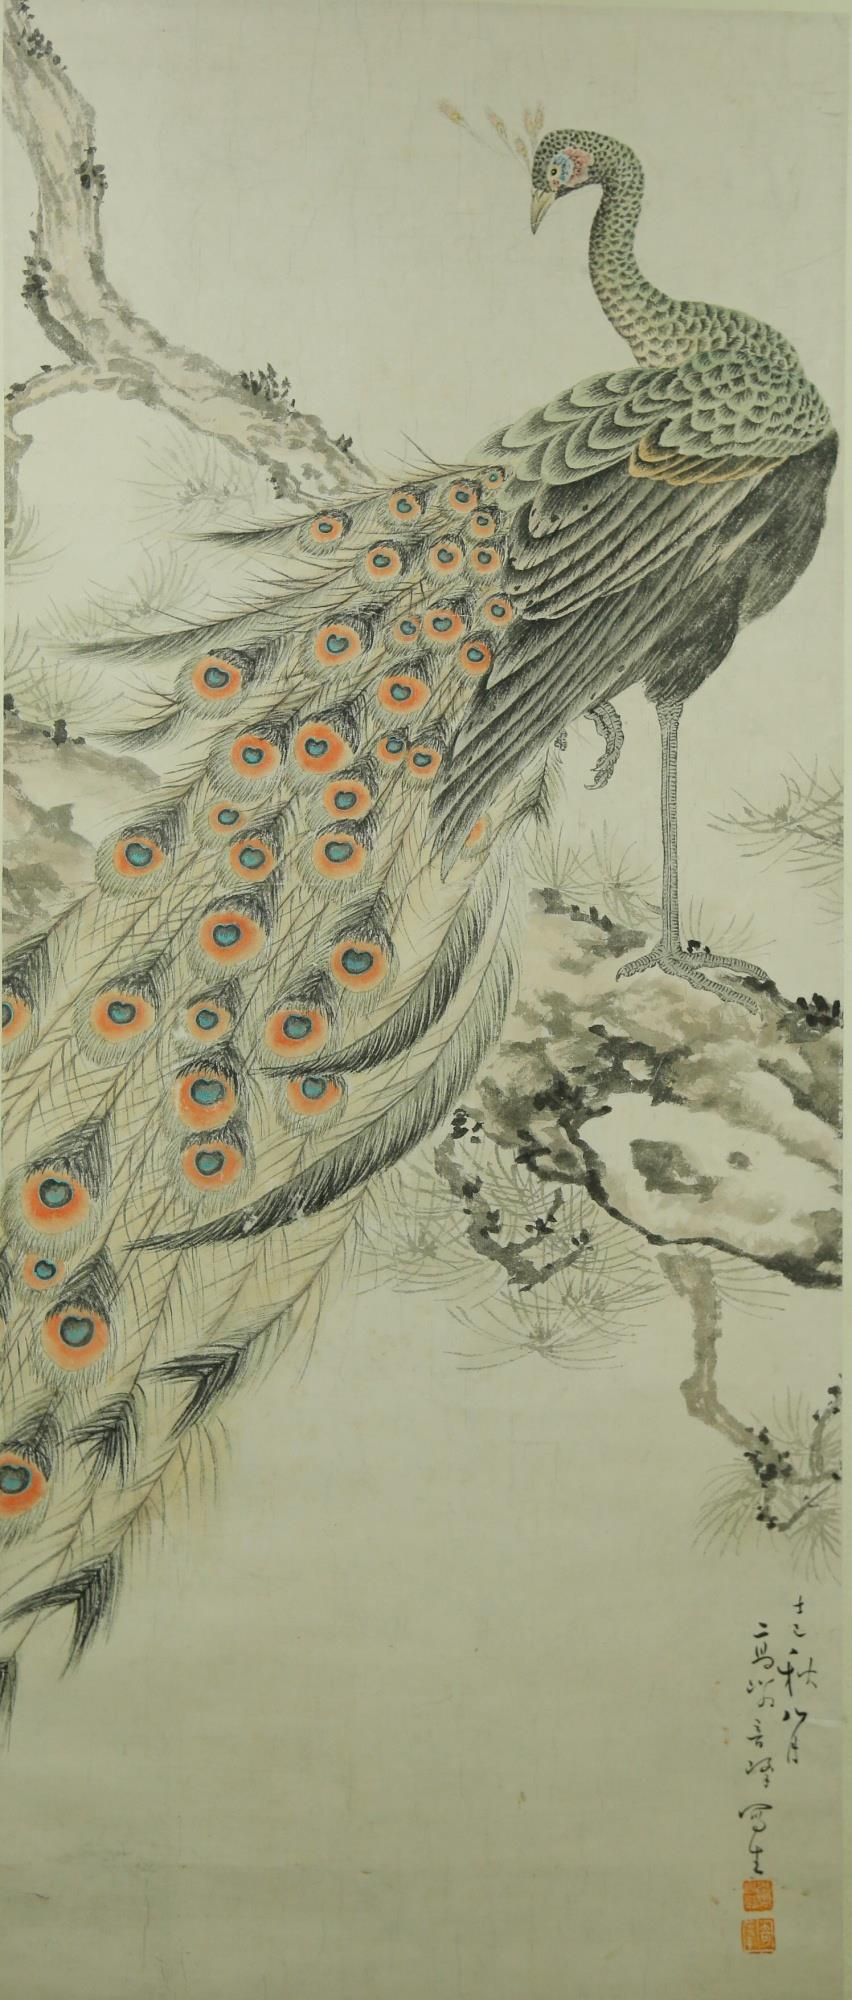 [url=https://flic.kr/p/29xRtU9][img]https://farm2.staticflickr.com/1848/43680012404_5998a56a80_o.jpg[/img][/url][url=https://flic.kr/p/29xRtU9]Gao Qifeng - Peacock standing on pine tree branch, ink and watercolour on paper, hanging scroll[/url] by [url=https://www.flickr.com/photos/am-jochim/]Mark Jochim[/url], on Flickr